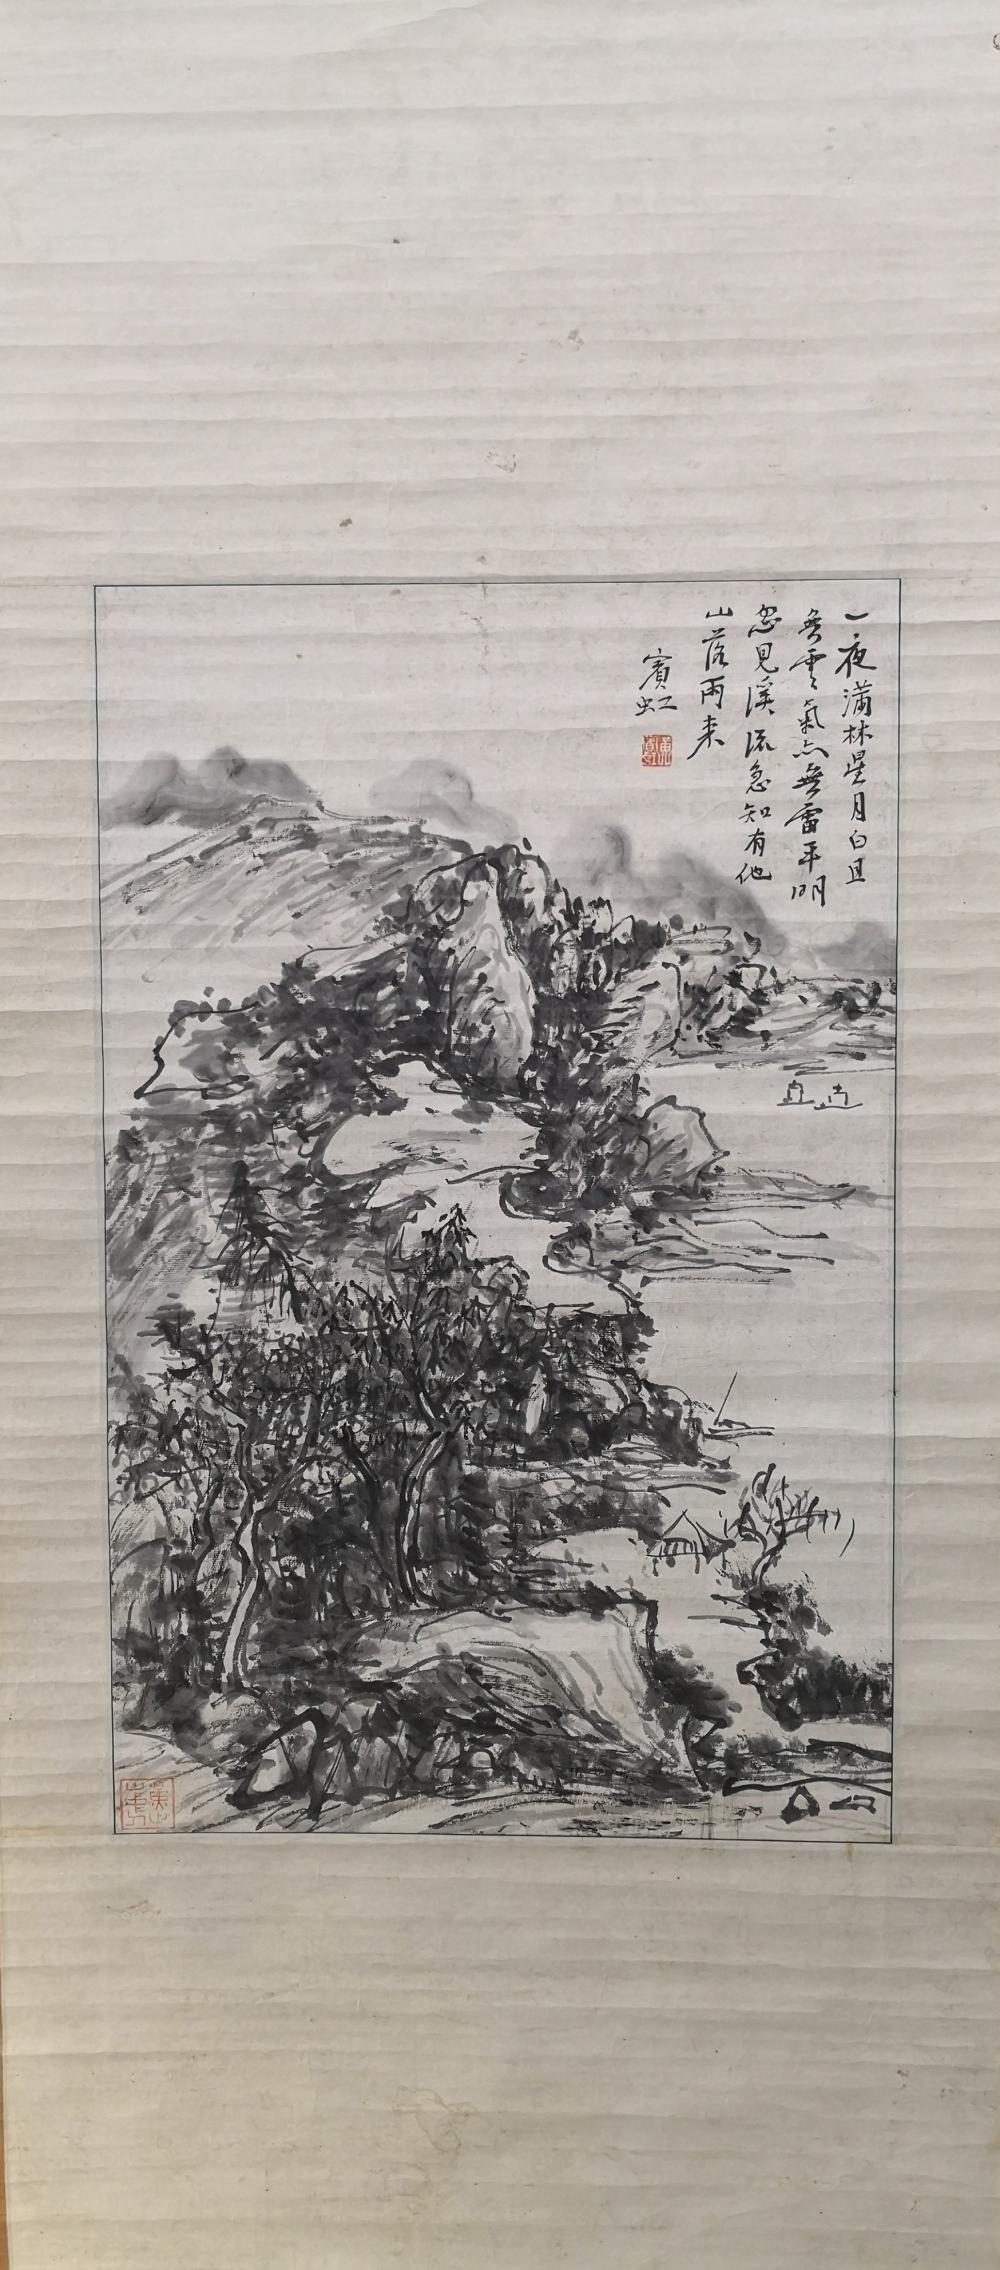 A CHINESE PAINTING BY HUANG BINHONG